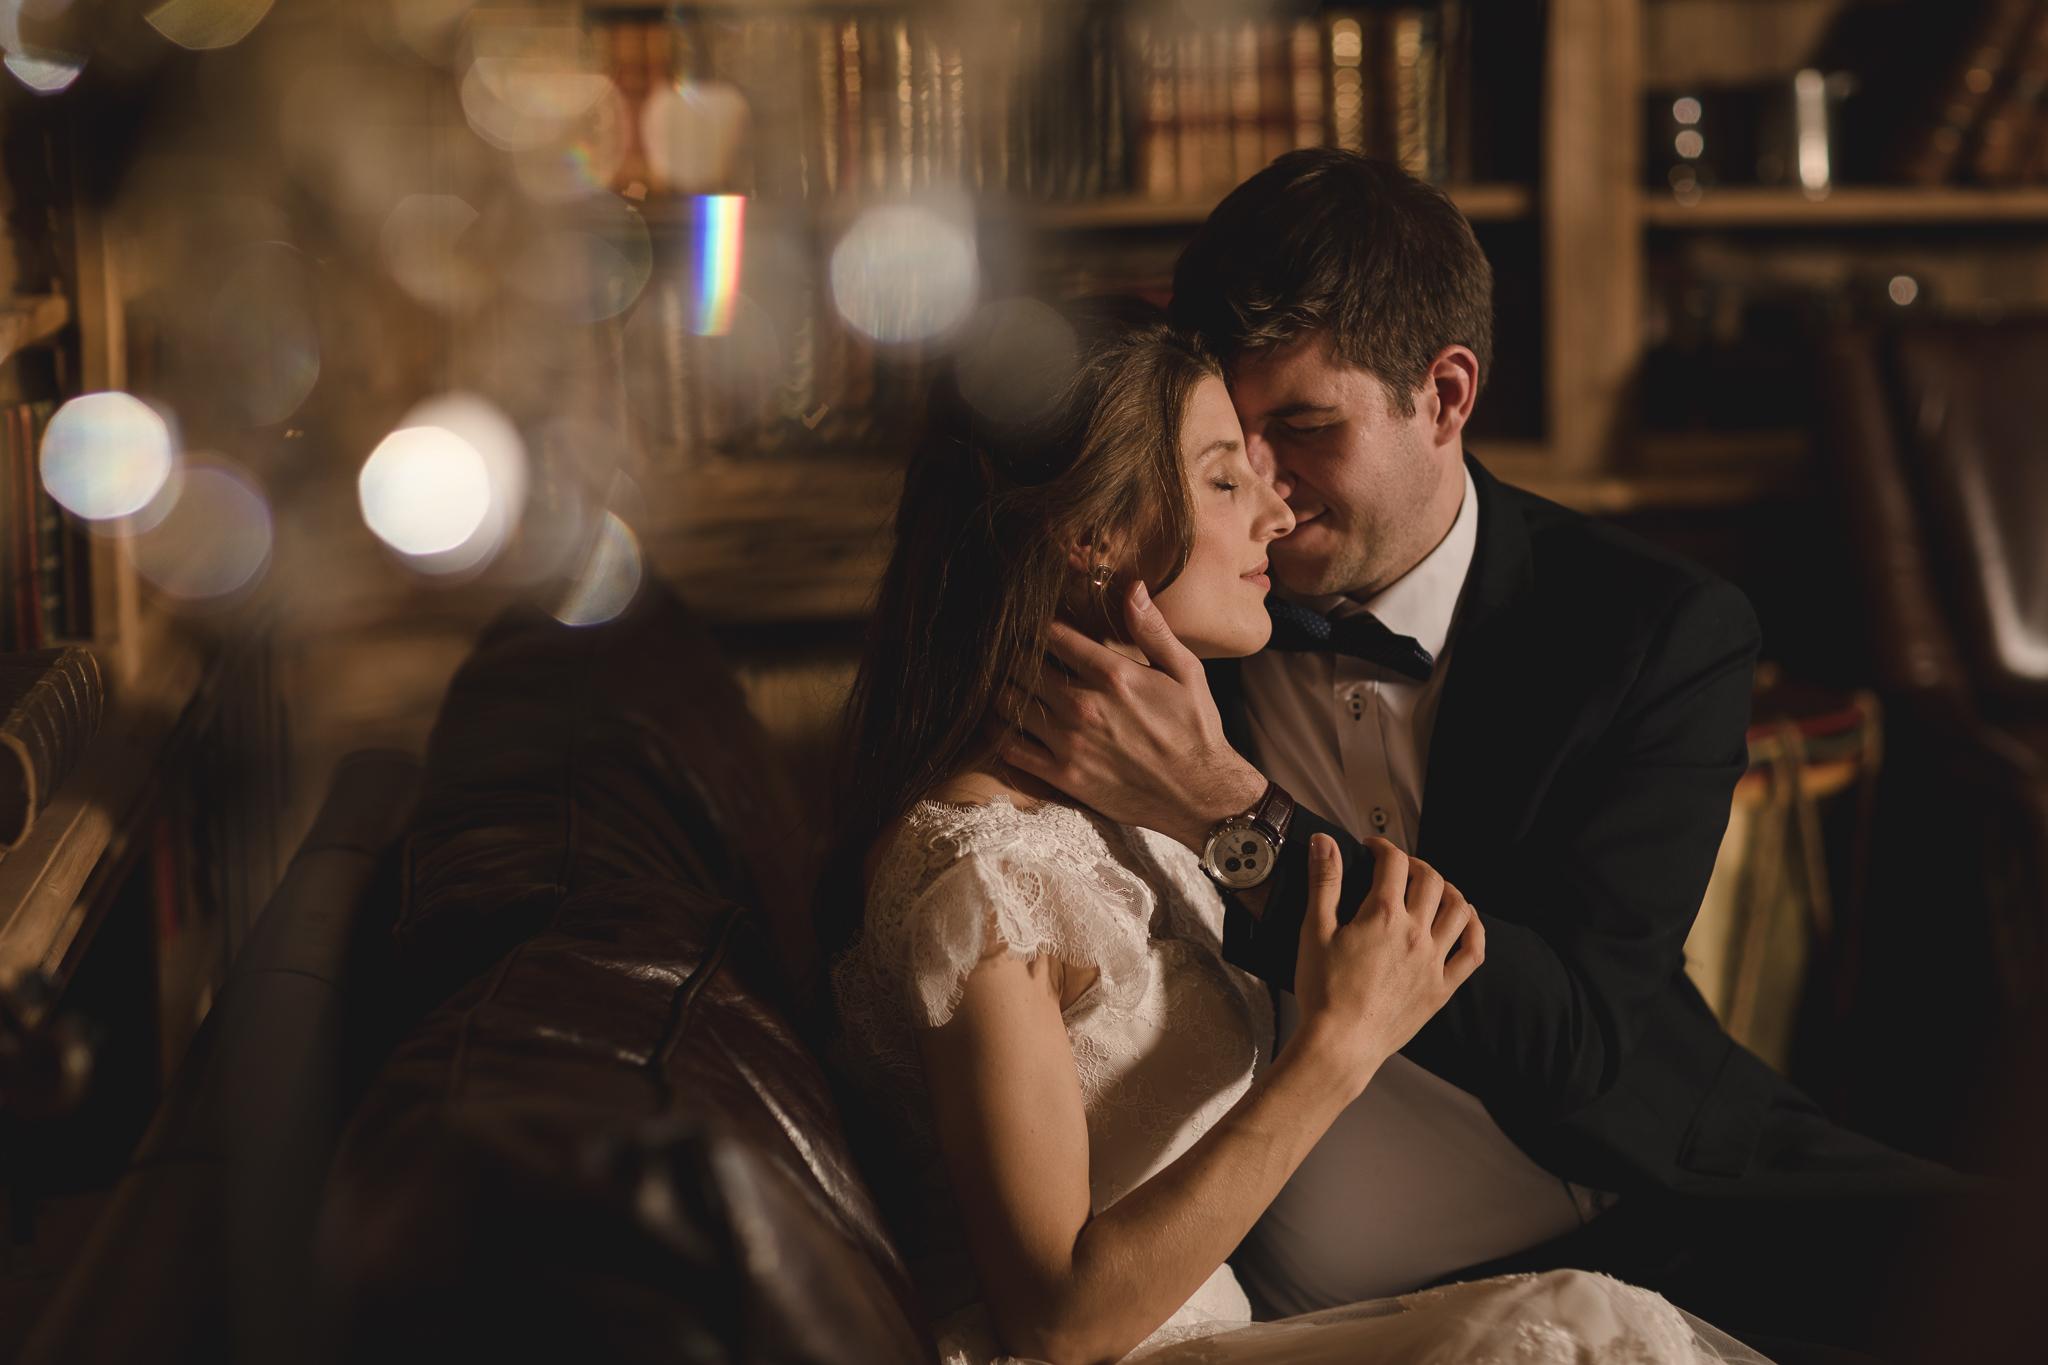 Winterhochzeit, Romantik, Brautpaar